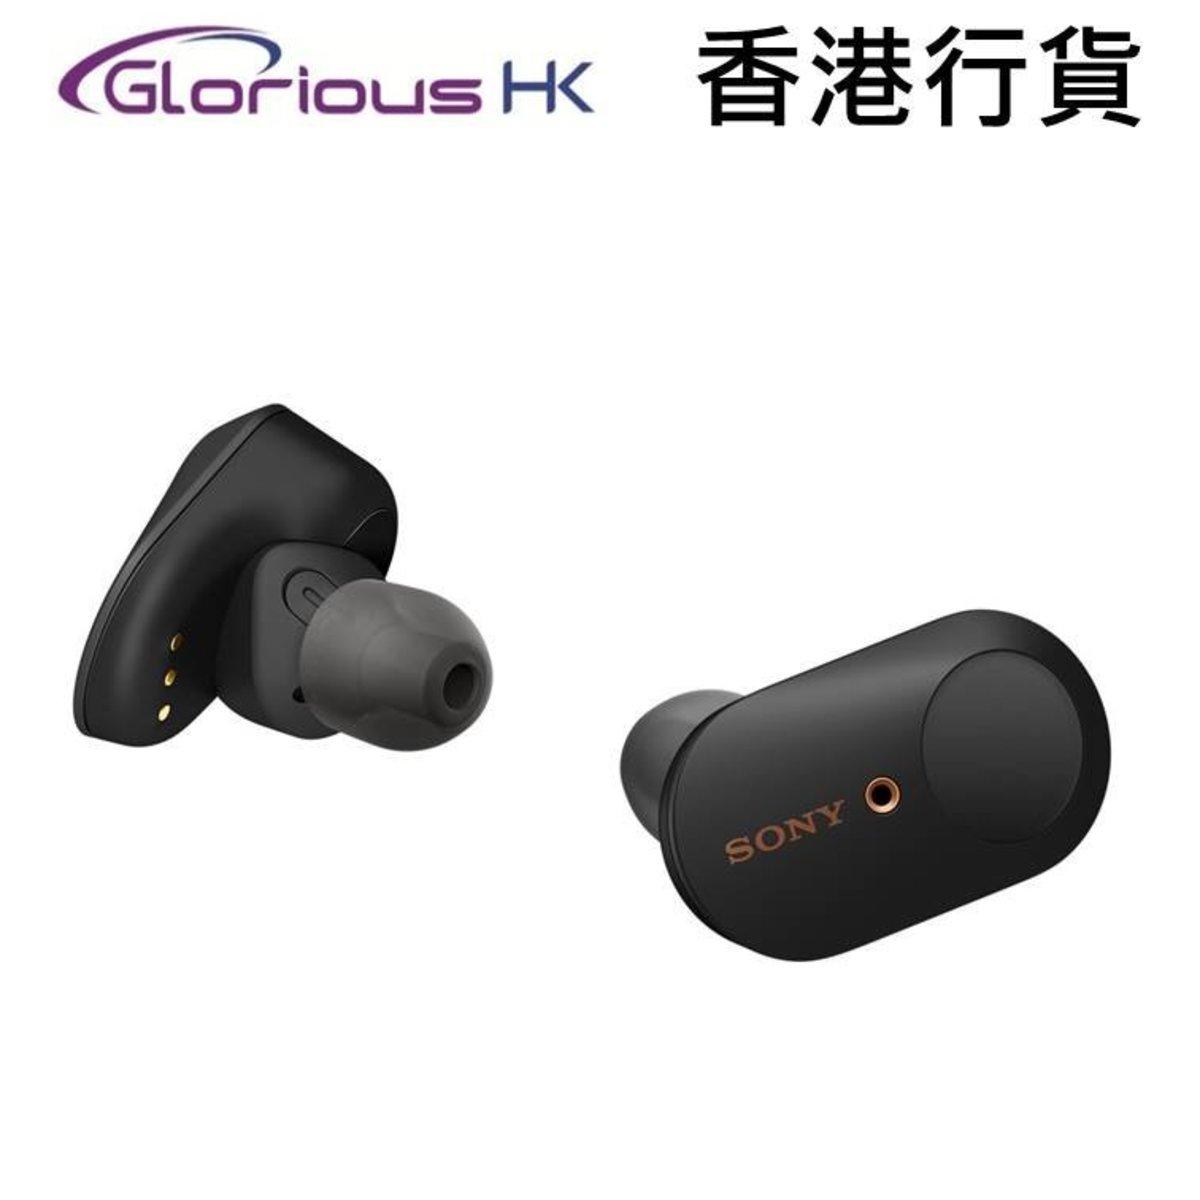 Wireless Noise Cancelling Headphones WF-1000XM3 Black